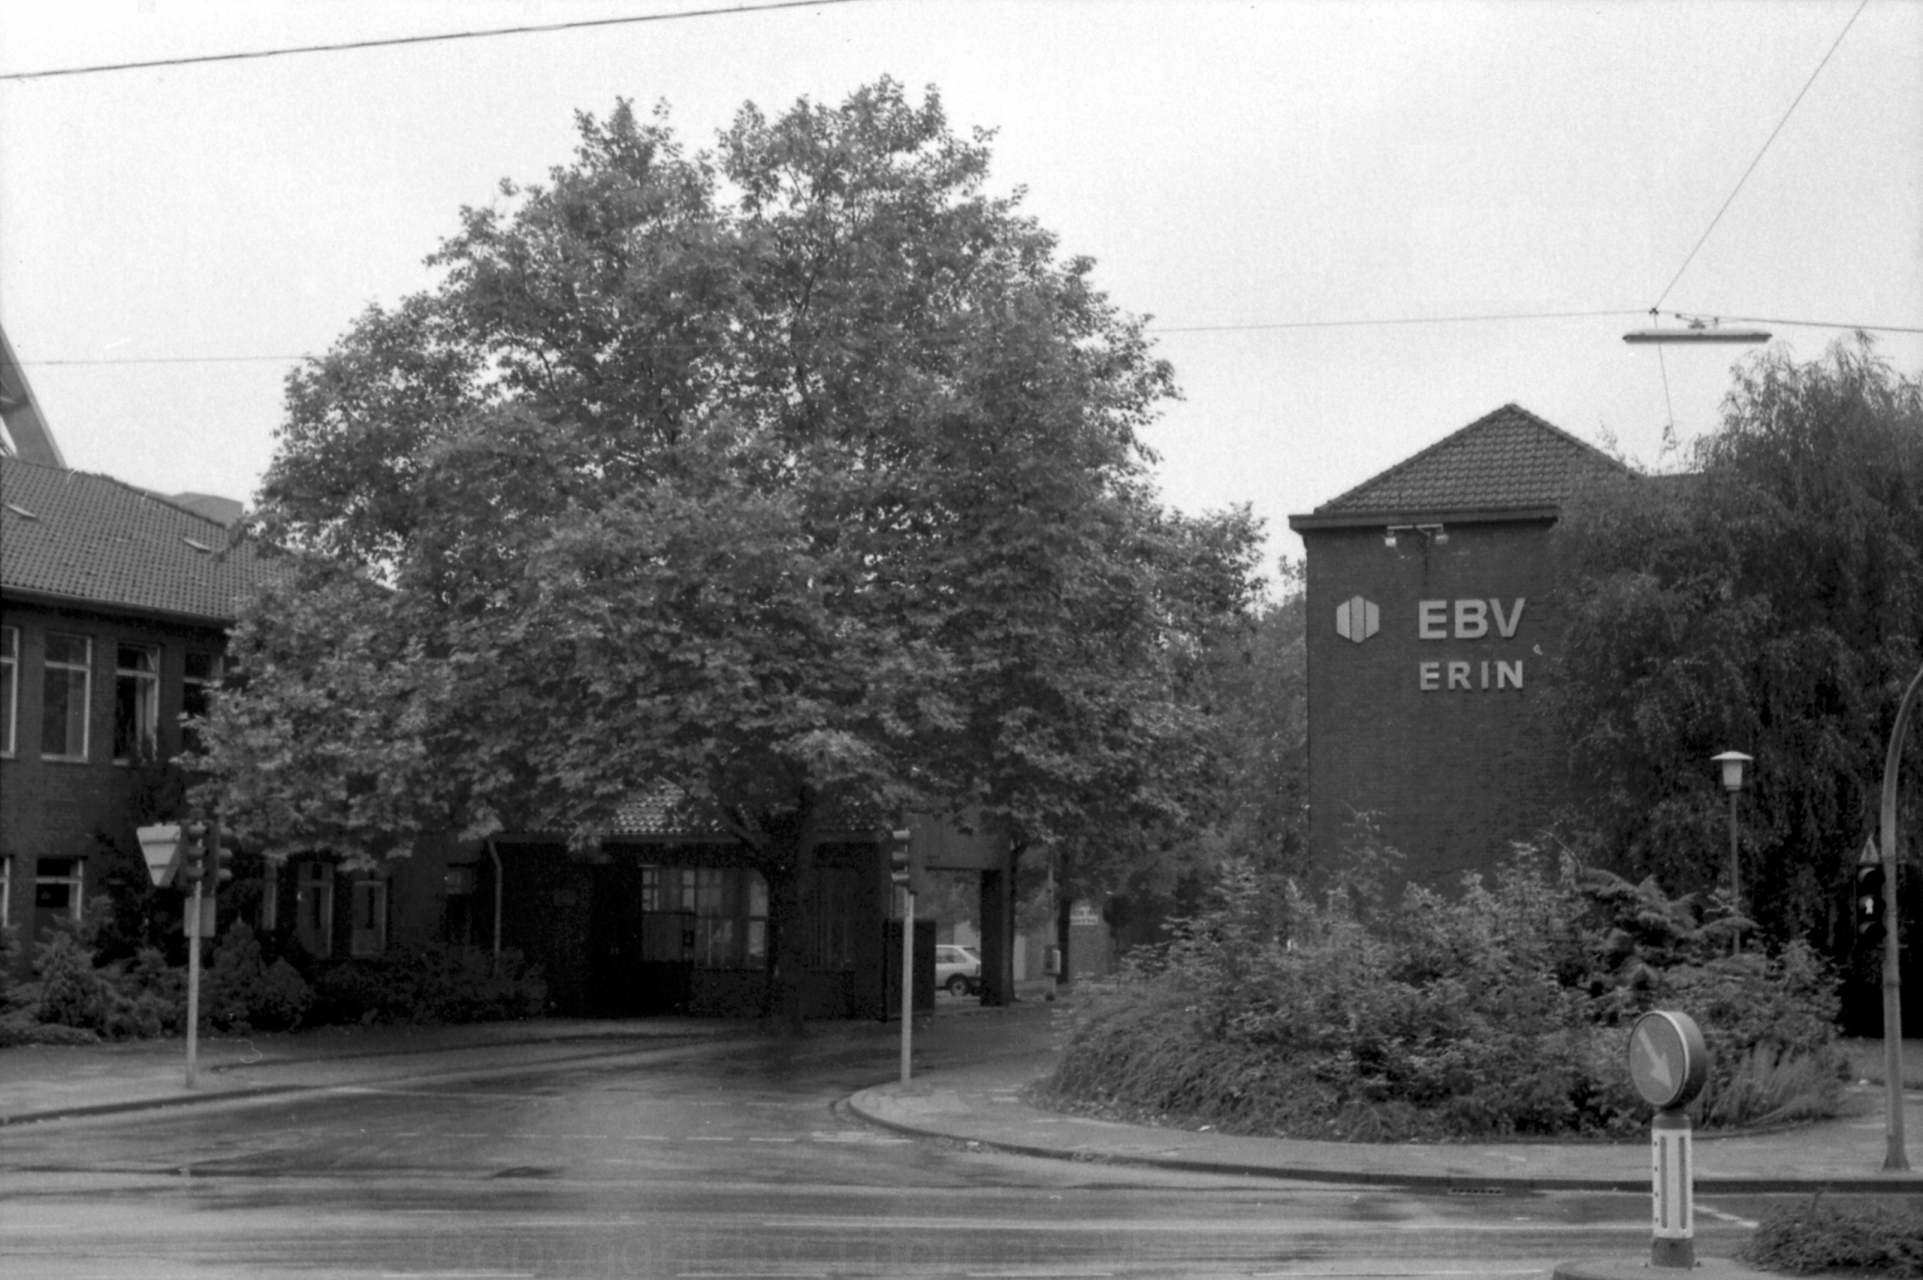 Haupttor Zeche Erin - Widumer Straße